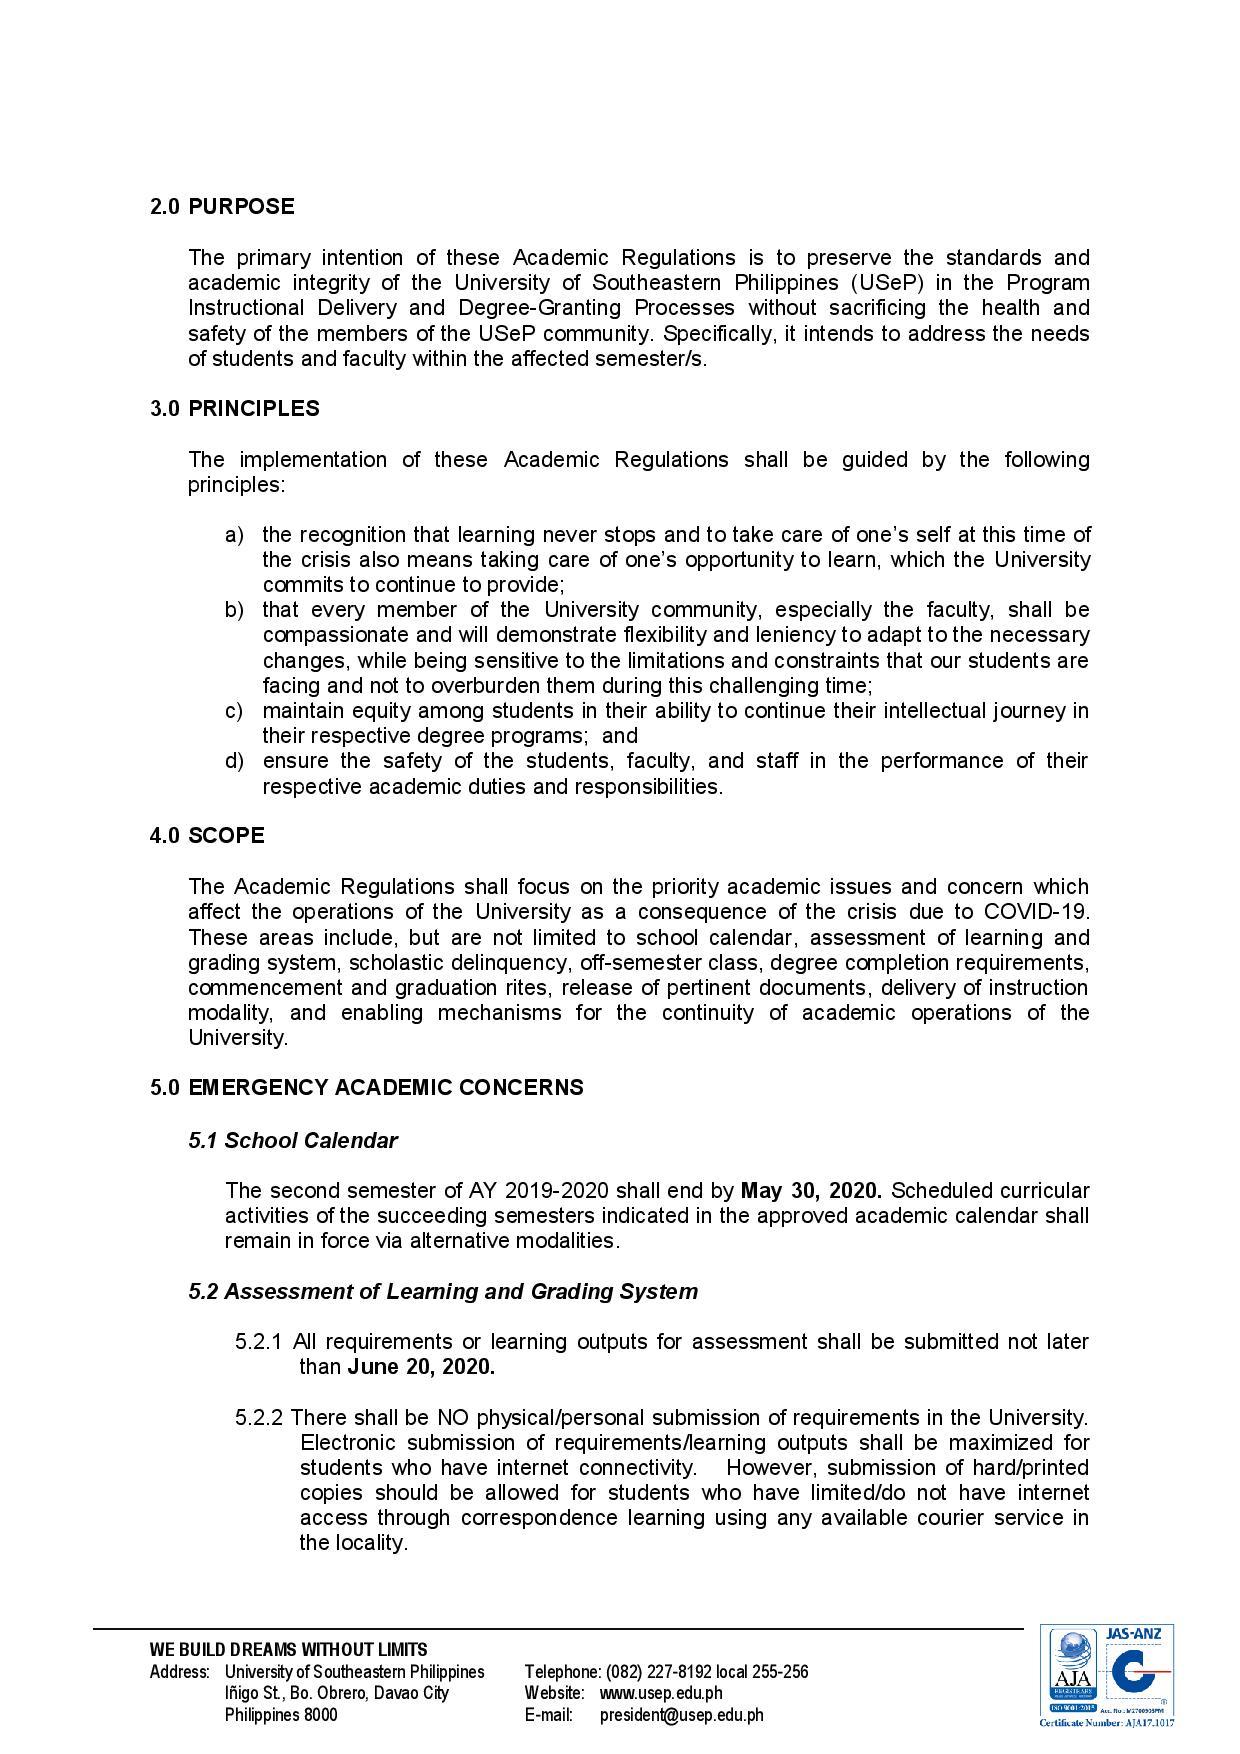 mc-02-s-2020-memorandum-circular-on-usep-academic-regulations-amidst-the-covid-19-pandemic-page-002